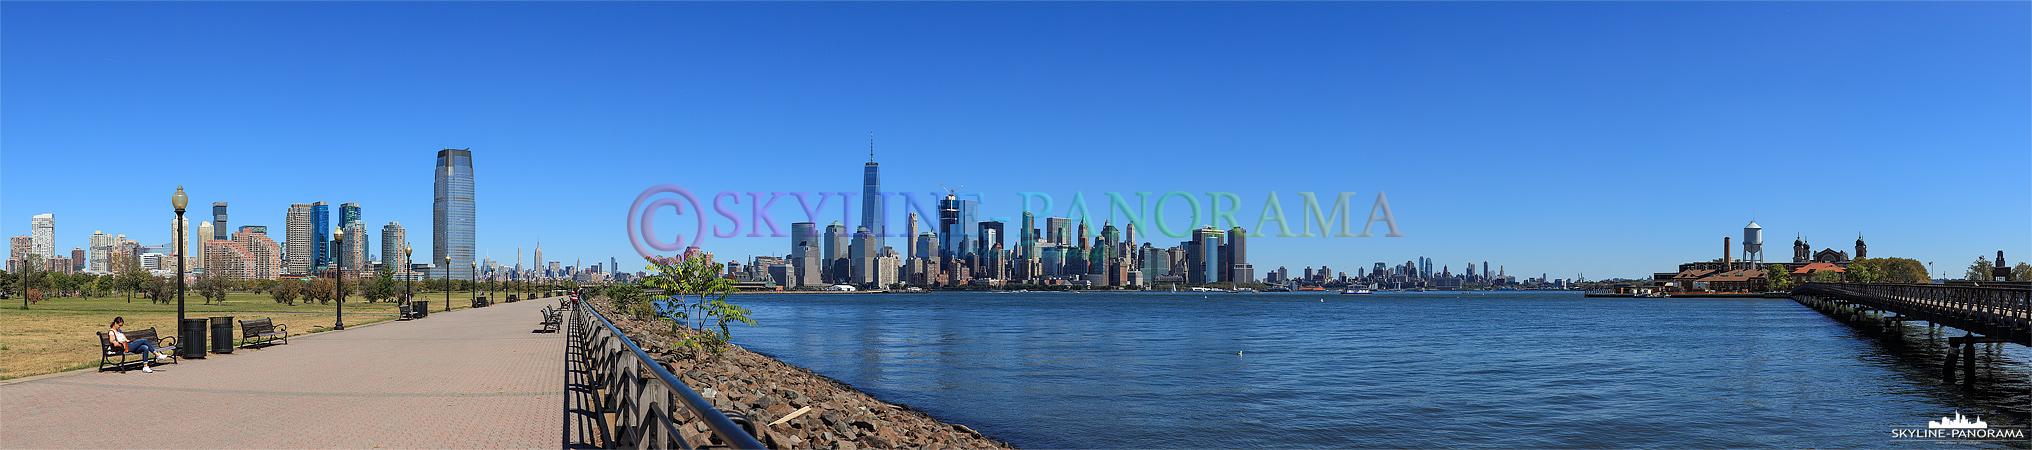 Liberty State Park Panorama - New York